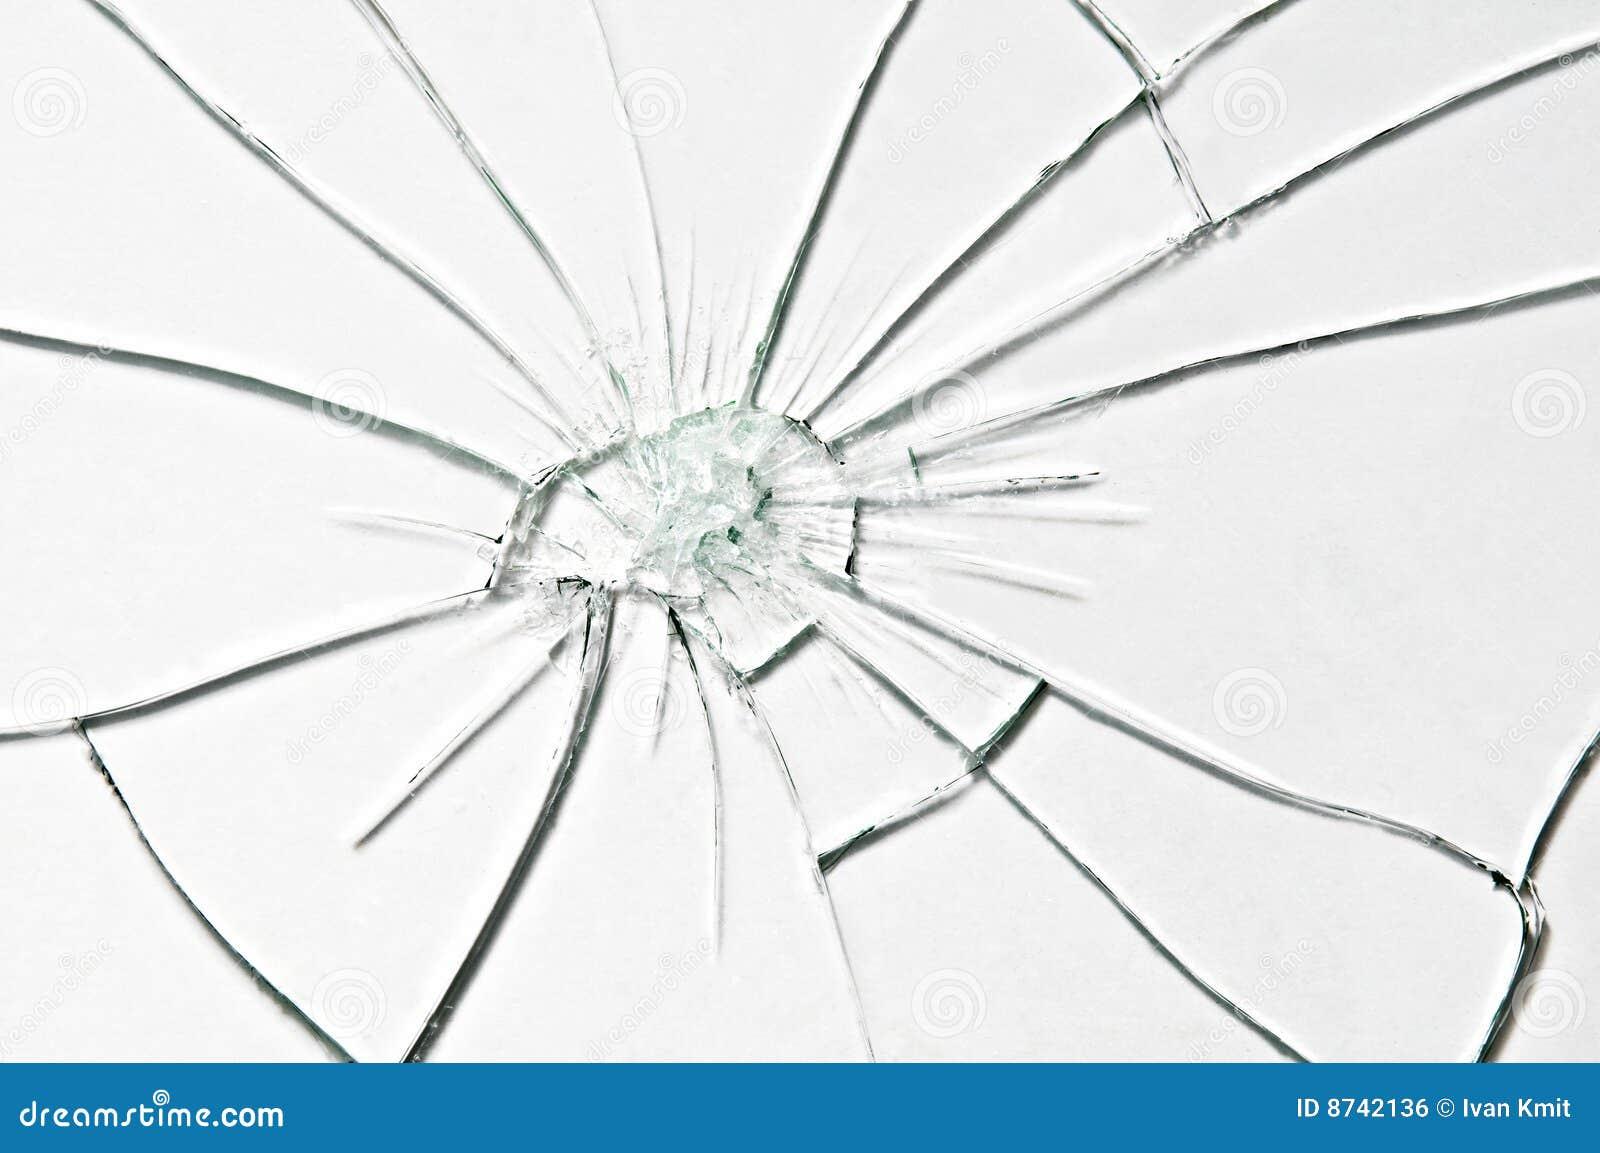 how to keep car window up when broken